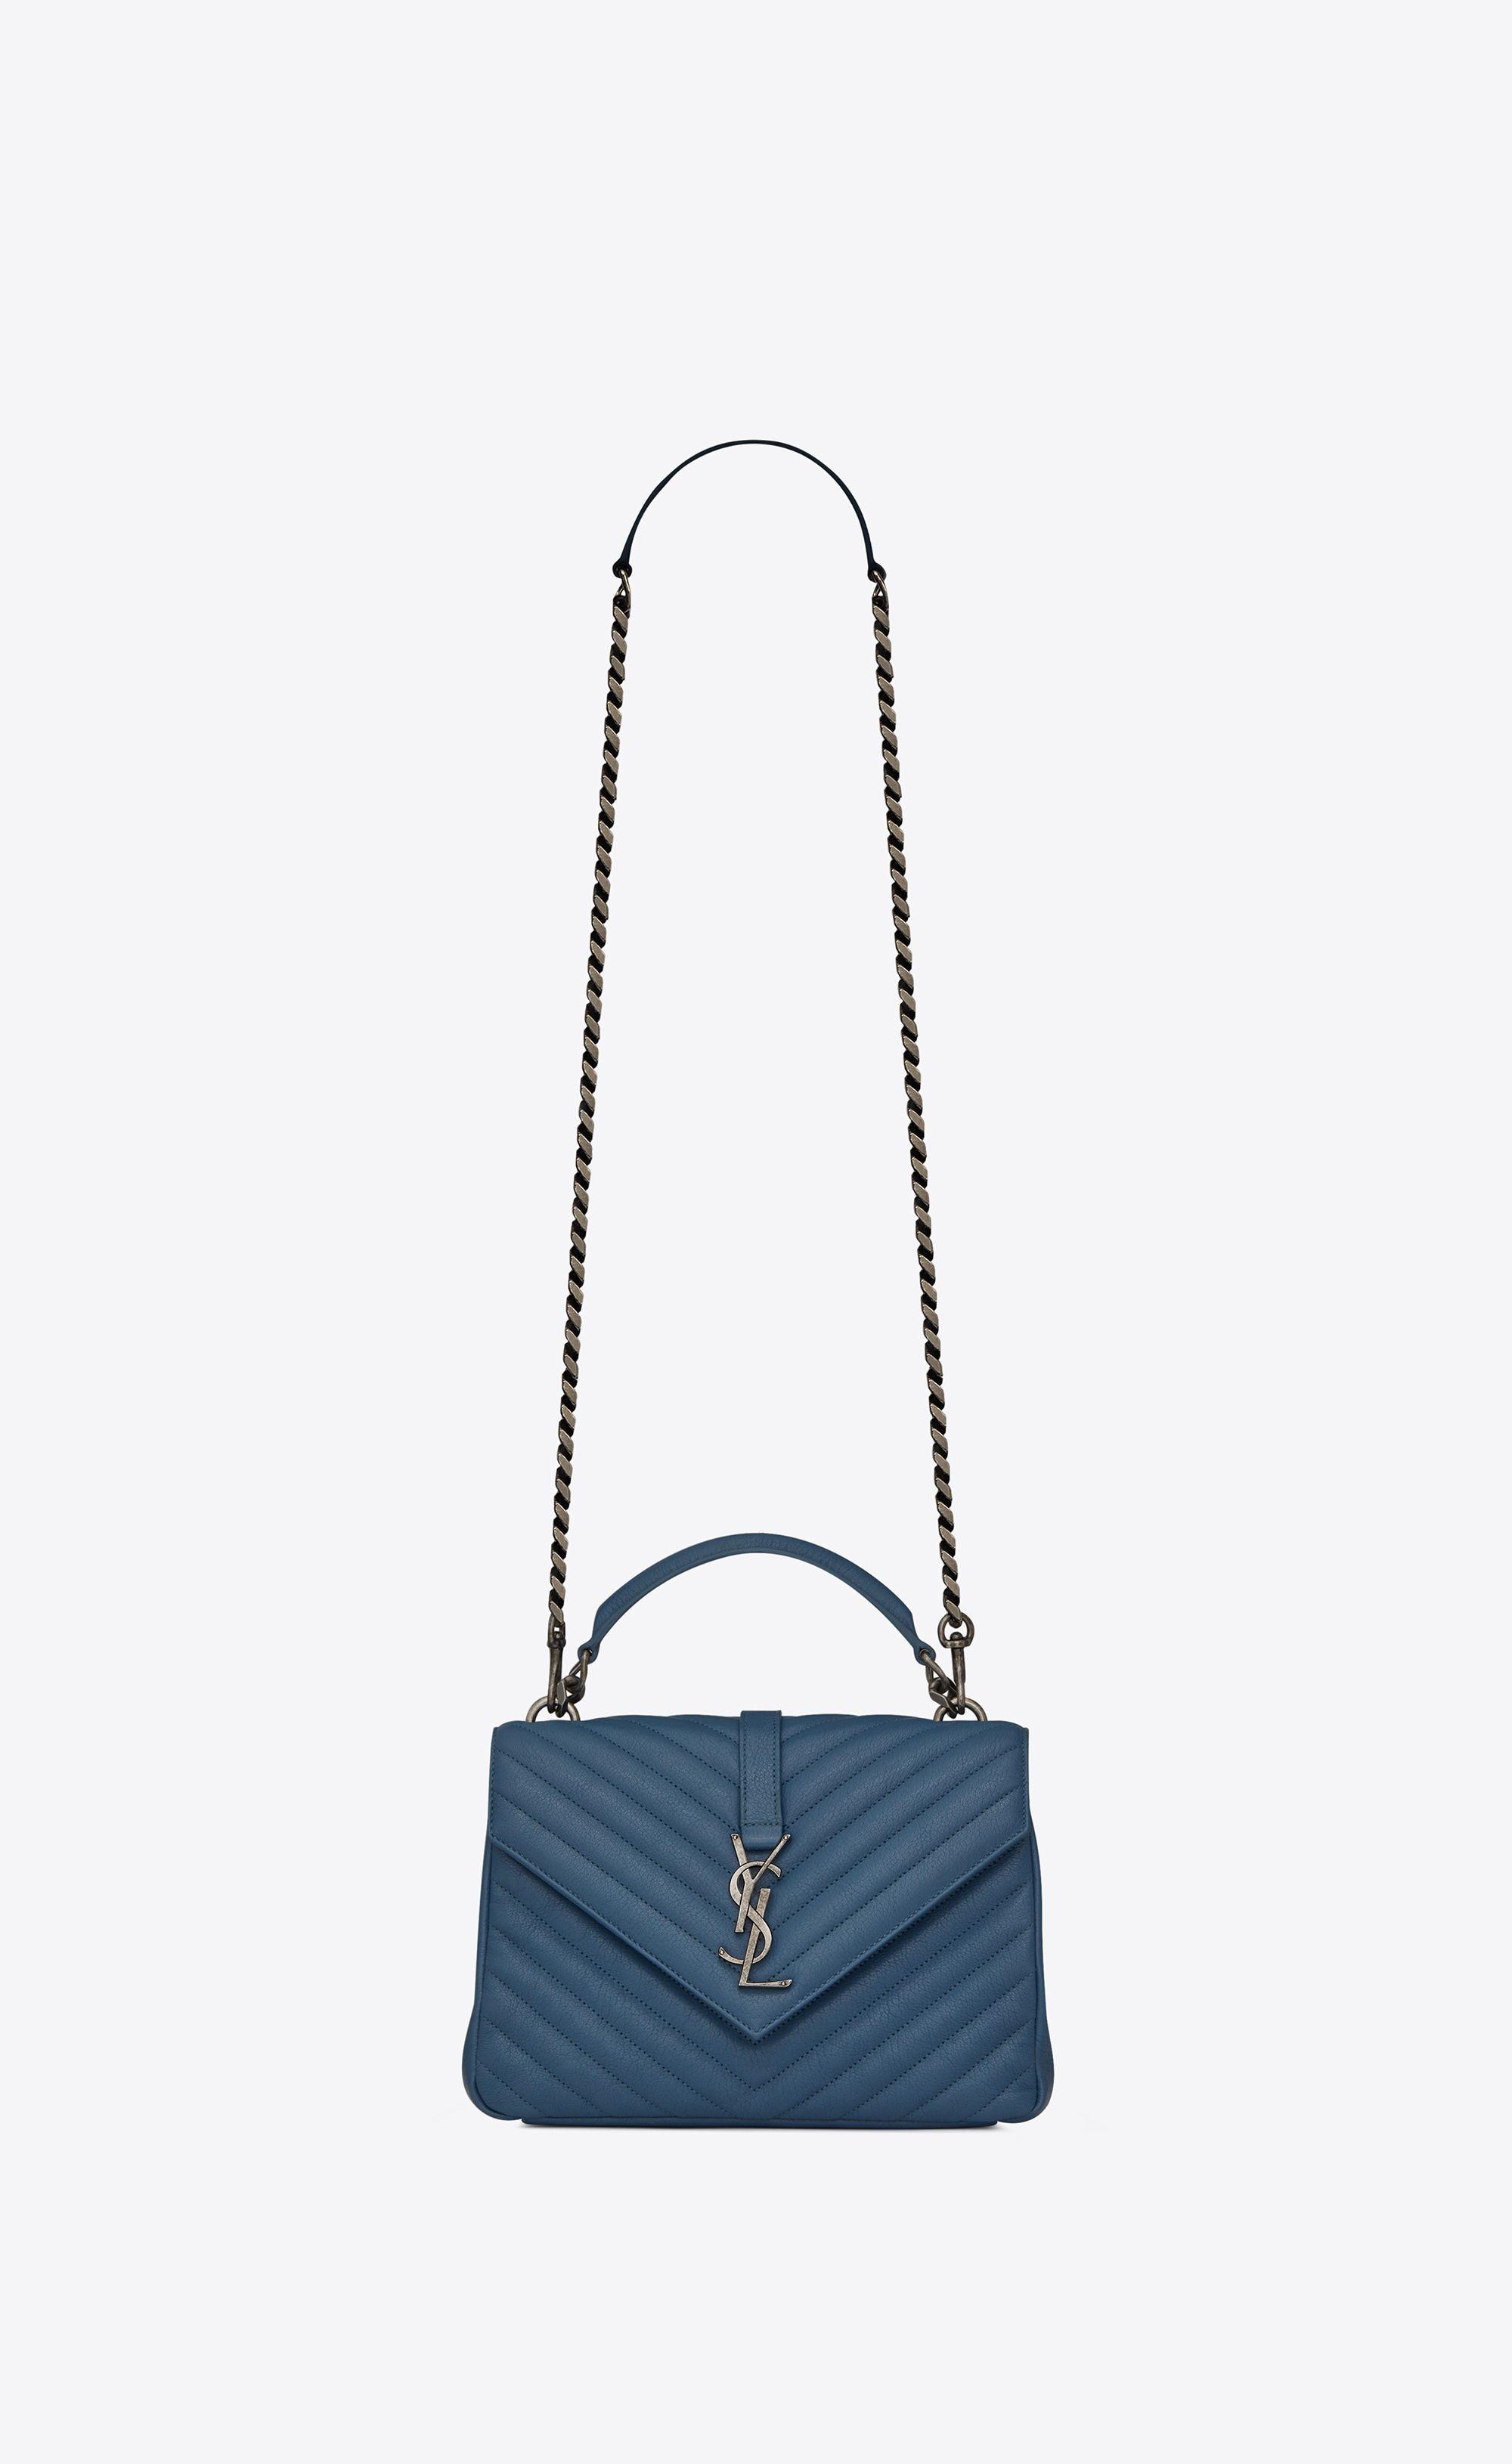 e348b0729a2 Saint Laurent Medium COLLEGE Bag In Denim Blue Quilted Leather   YSL.com